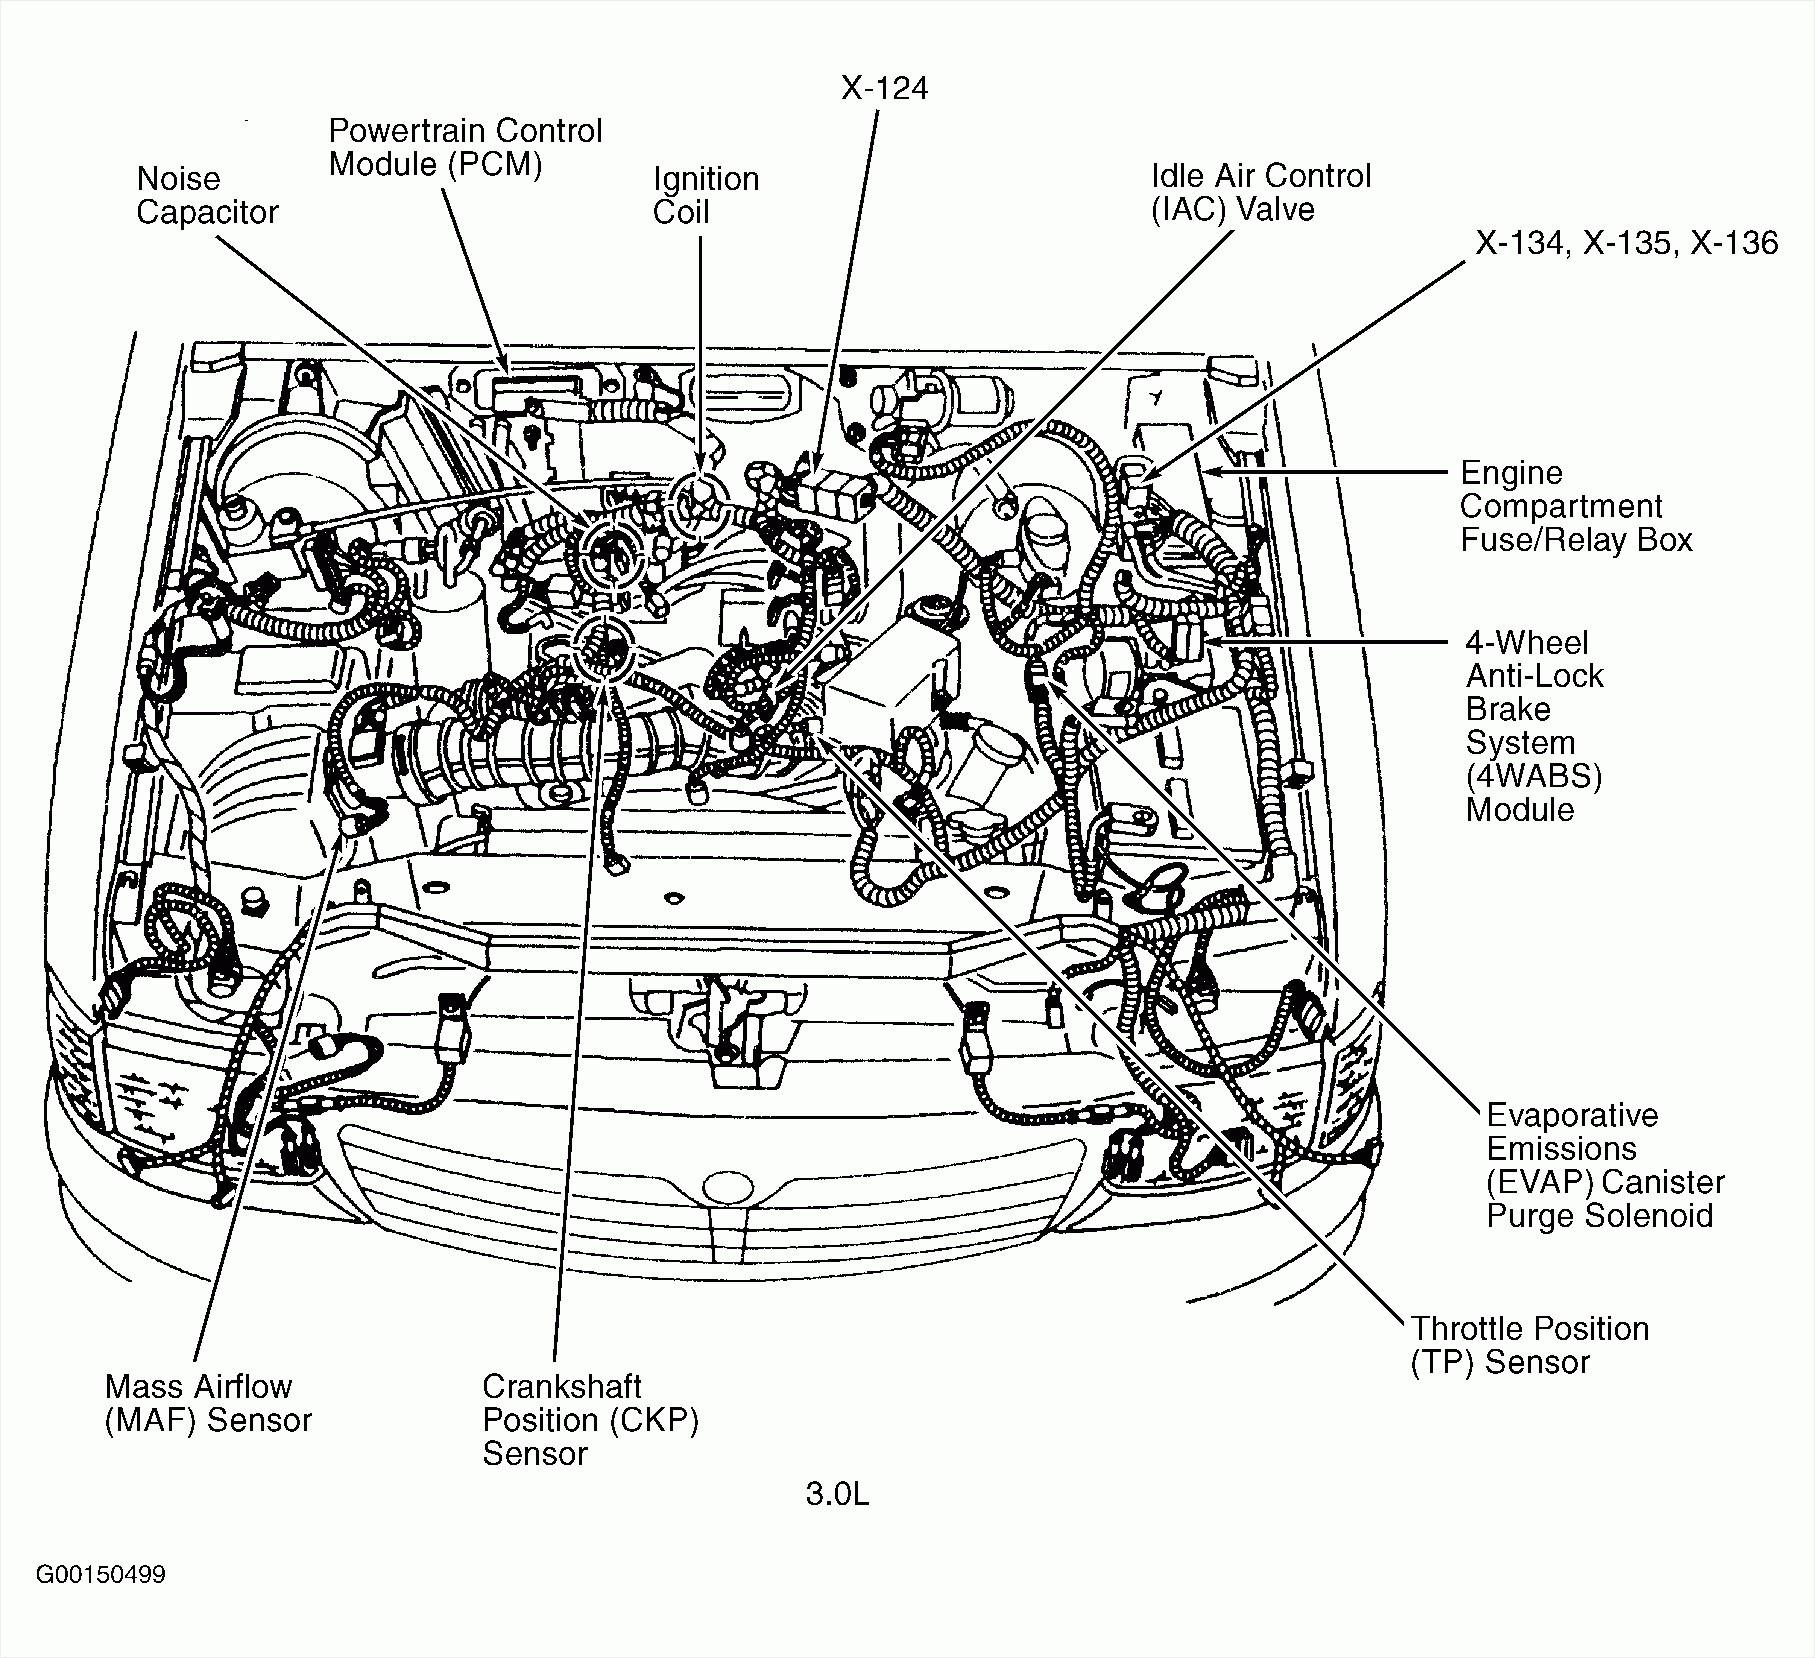 Mazda Mpv Engine Diagram Mazda Protege Engine Diagram Wiring source • Of Mazda Mpv Engine Diagram